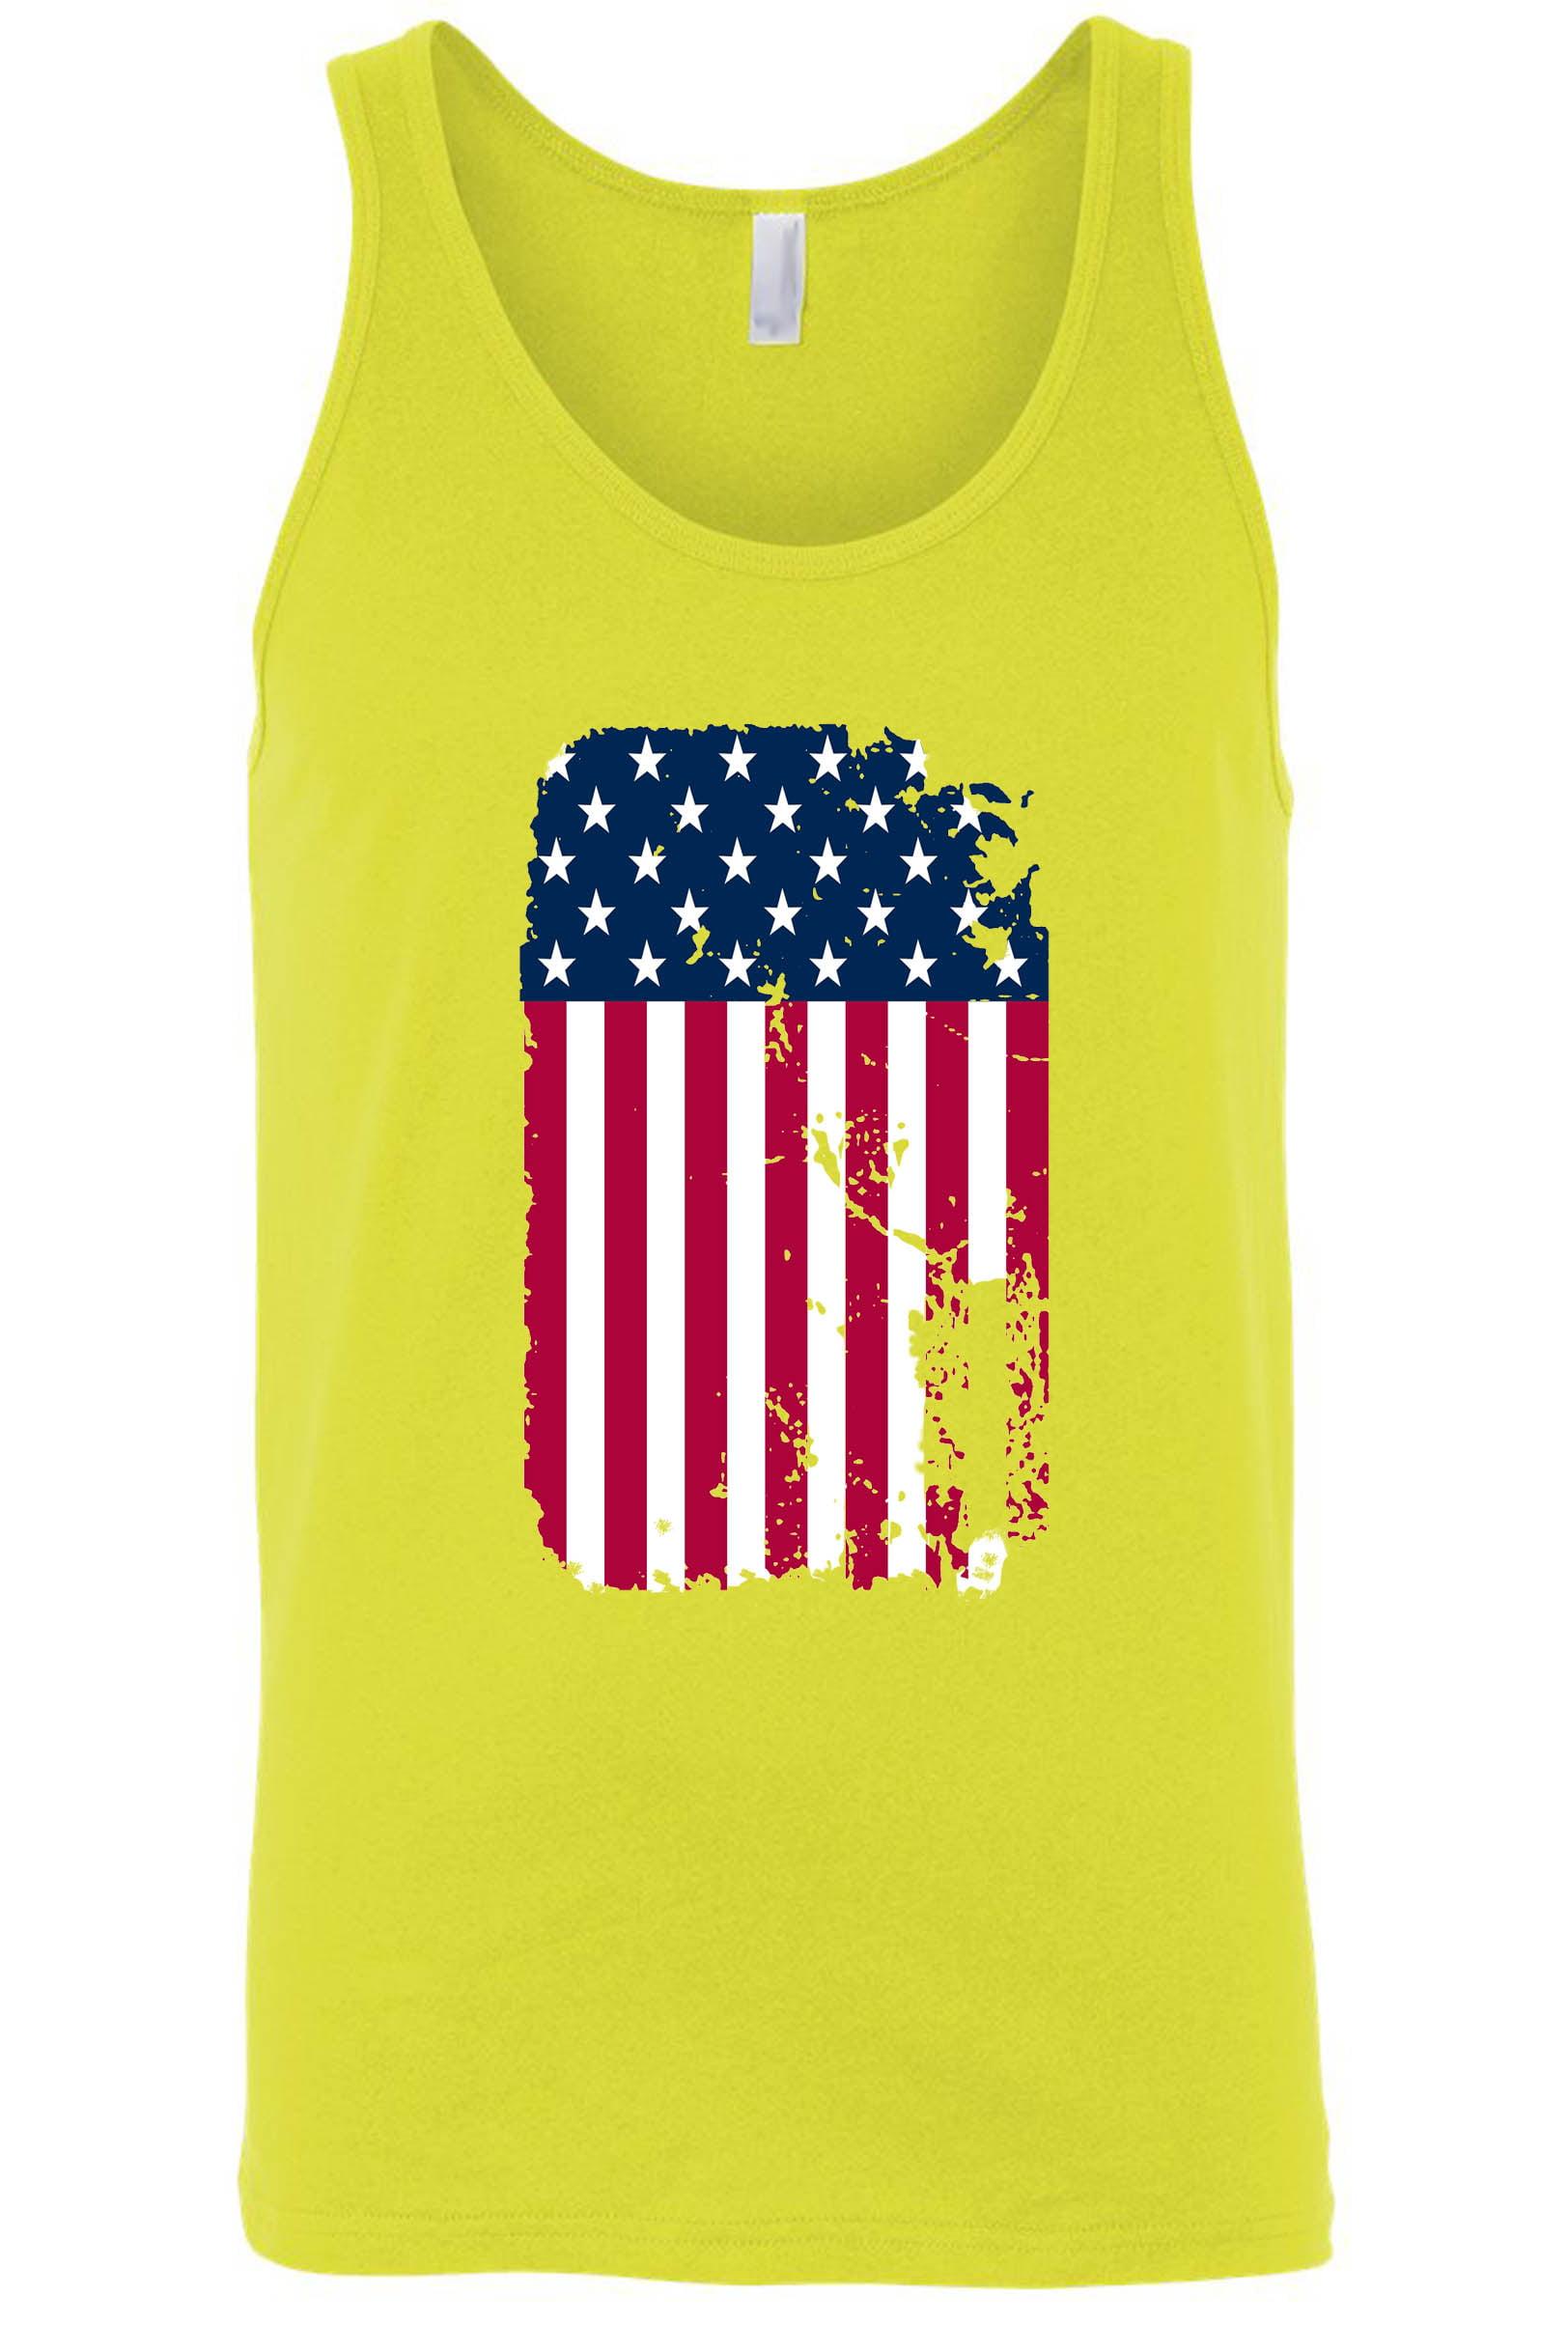 Men's/Unisex Painted USA Flag Tank Top Shirt